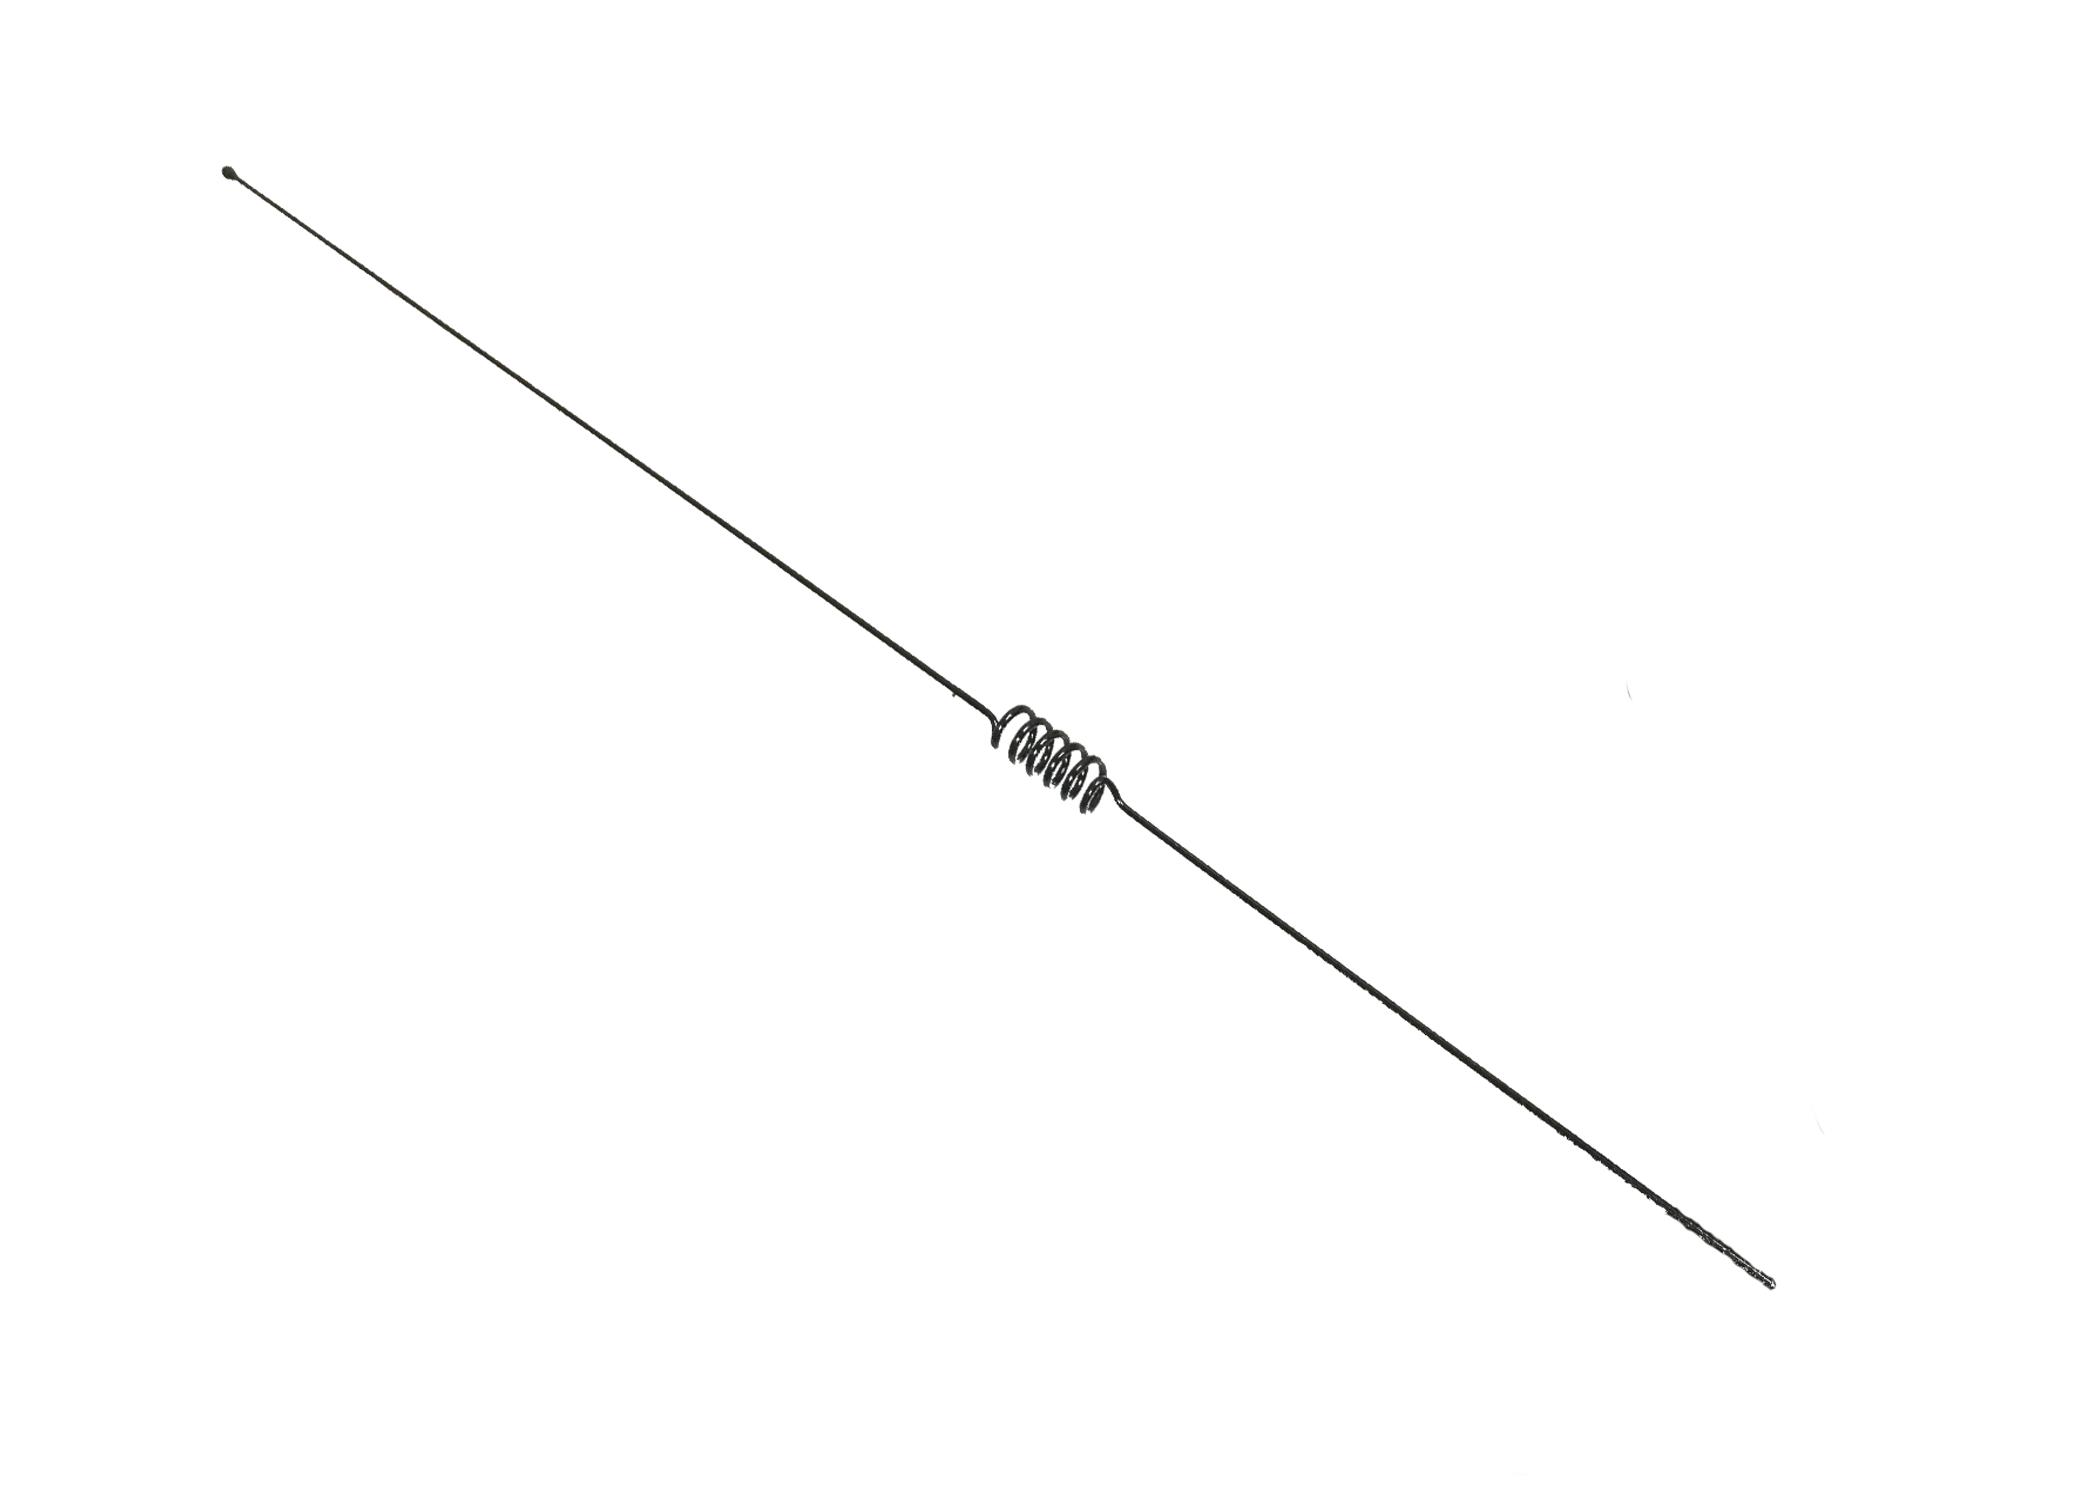 W144B - Larsen 440-460Mhx Cellular Style Whip Antenna Black